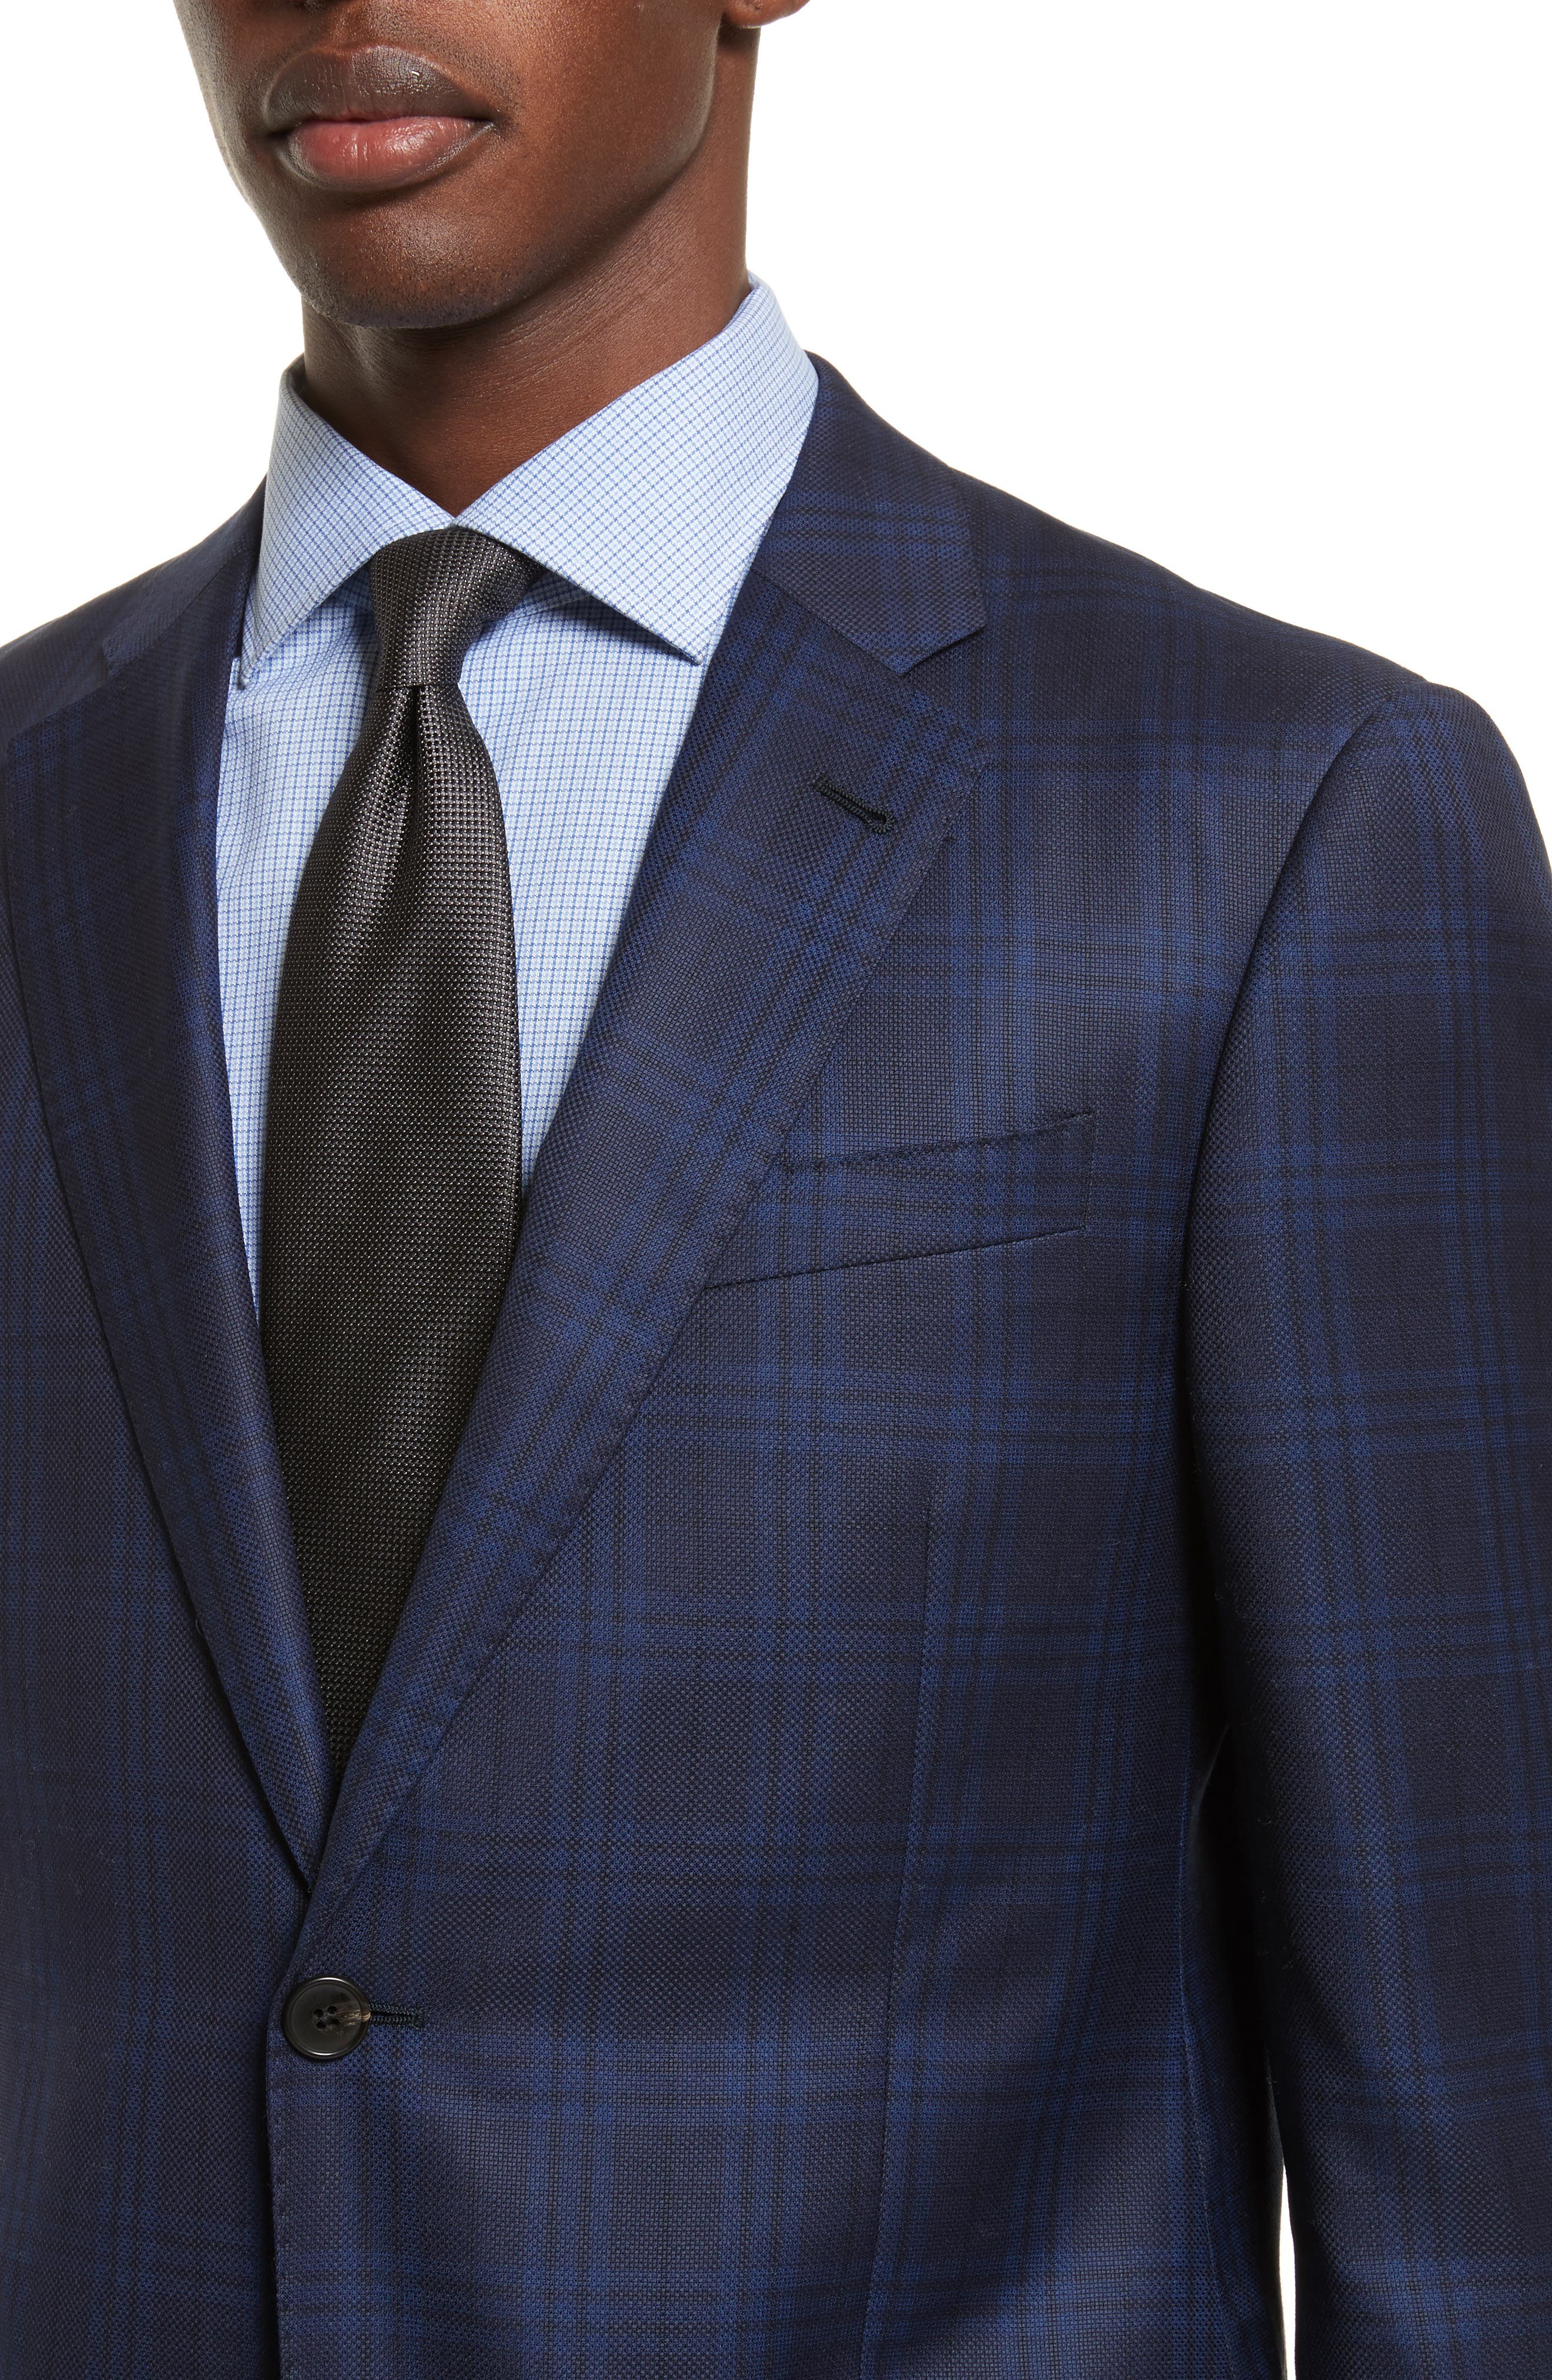 G-Line Trim Fit Houndstooth Wool Sport Coat,                             Alternate thumbnail 4, color,                             Navy